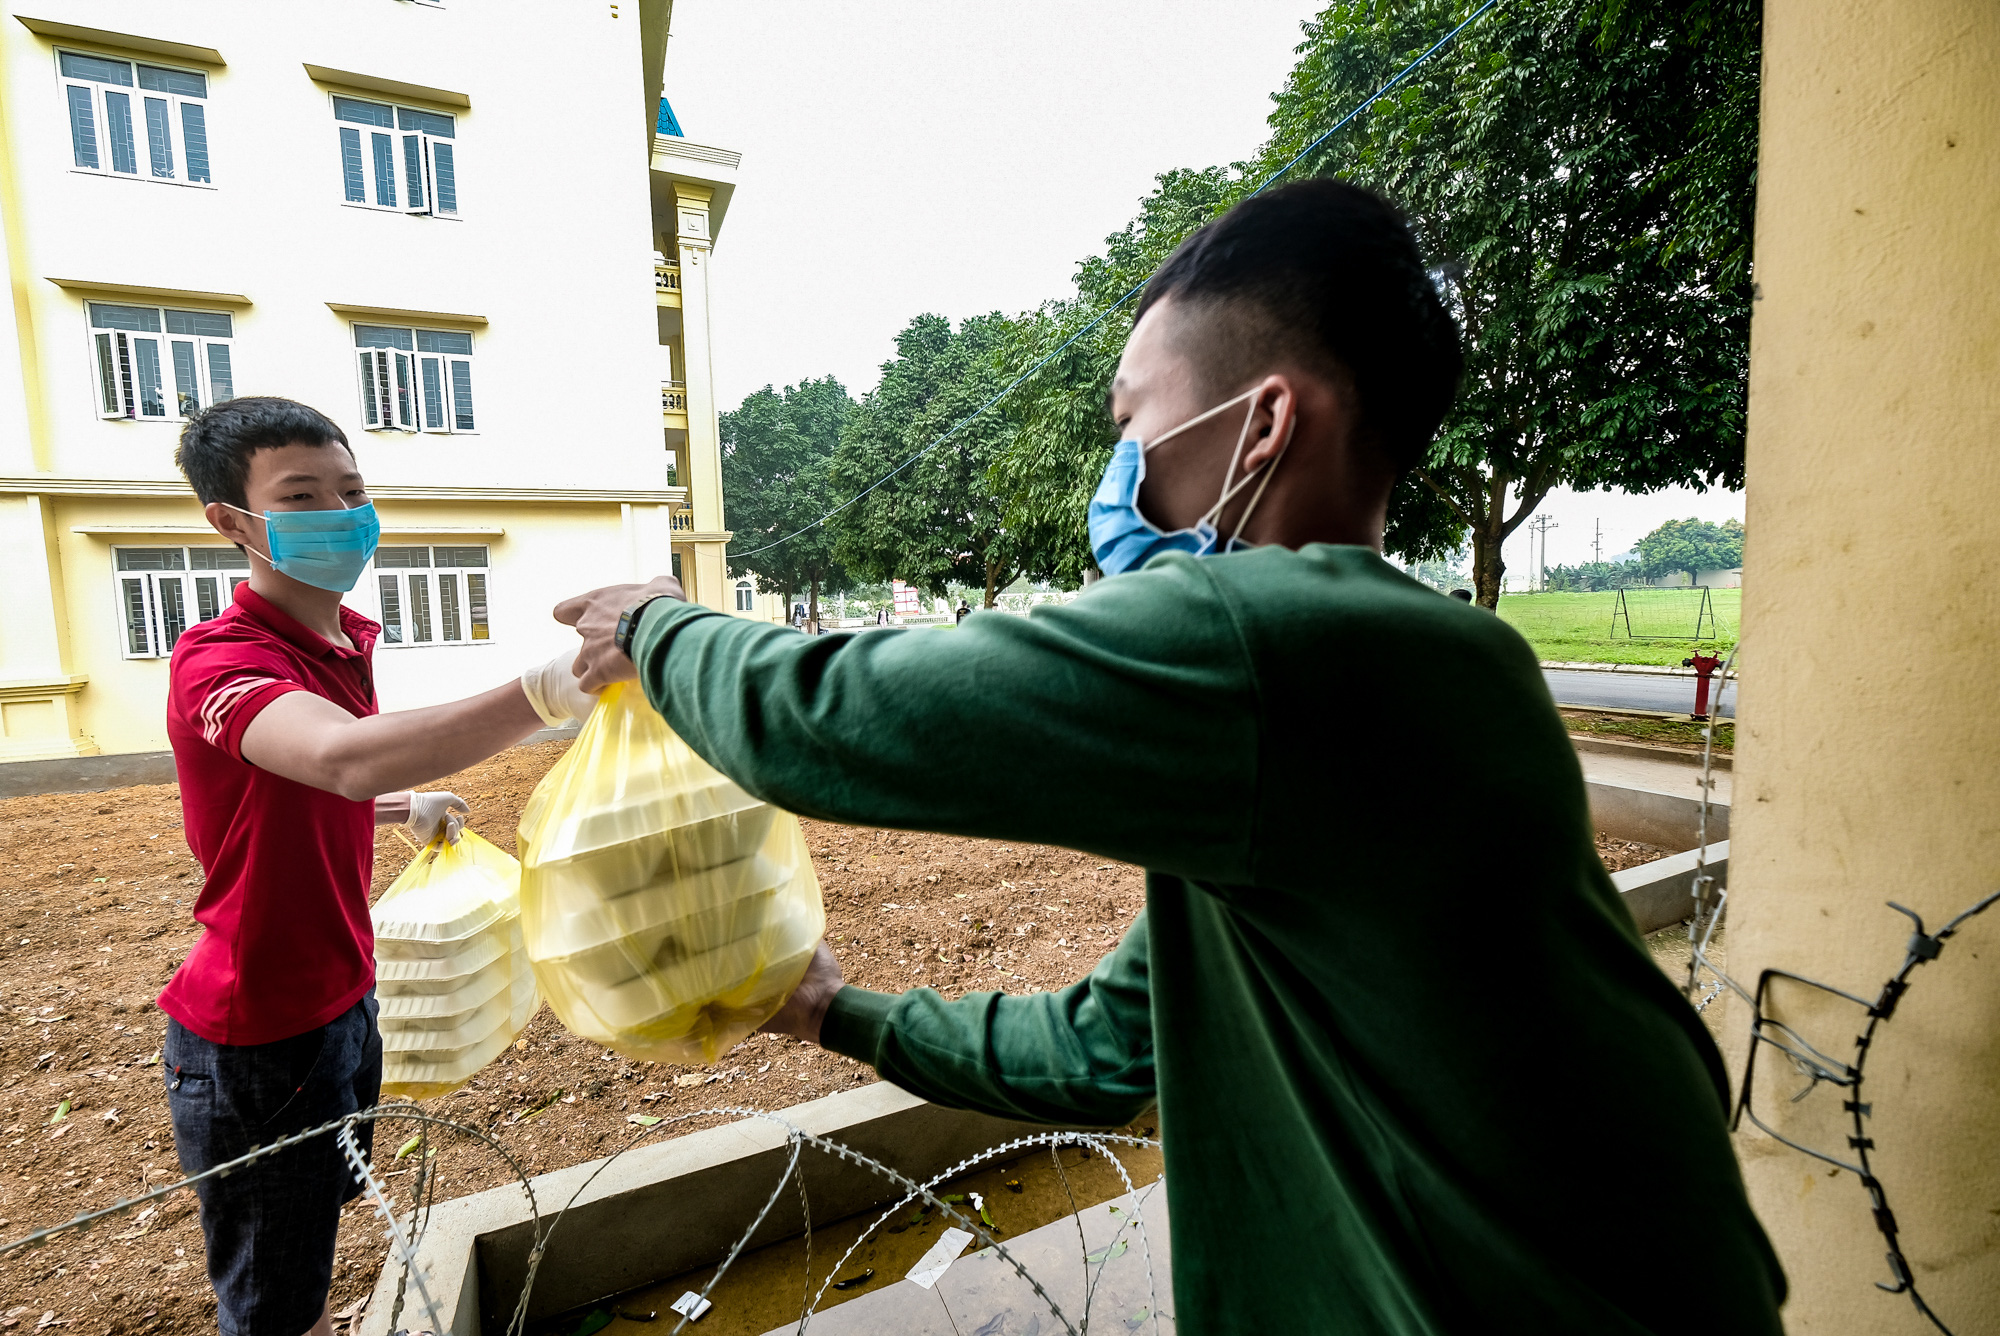 A soldier hands prepared meals to a person in isolation at a COVID-19 quarantine facility in Hanoi, Vietnam. Photo: Nam Tran / Tuoi Tre